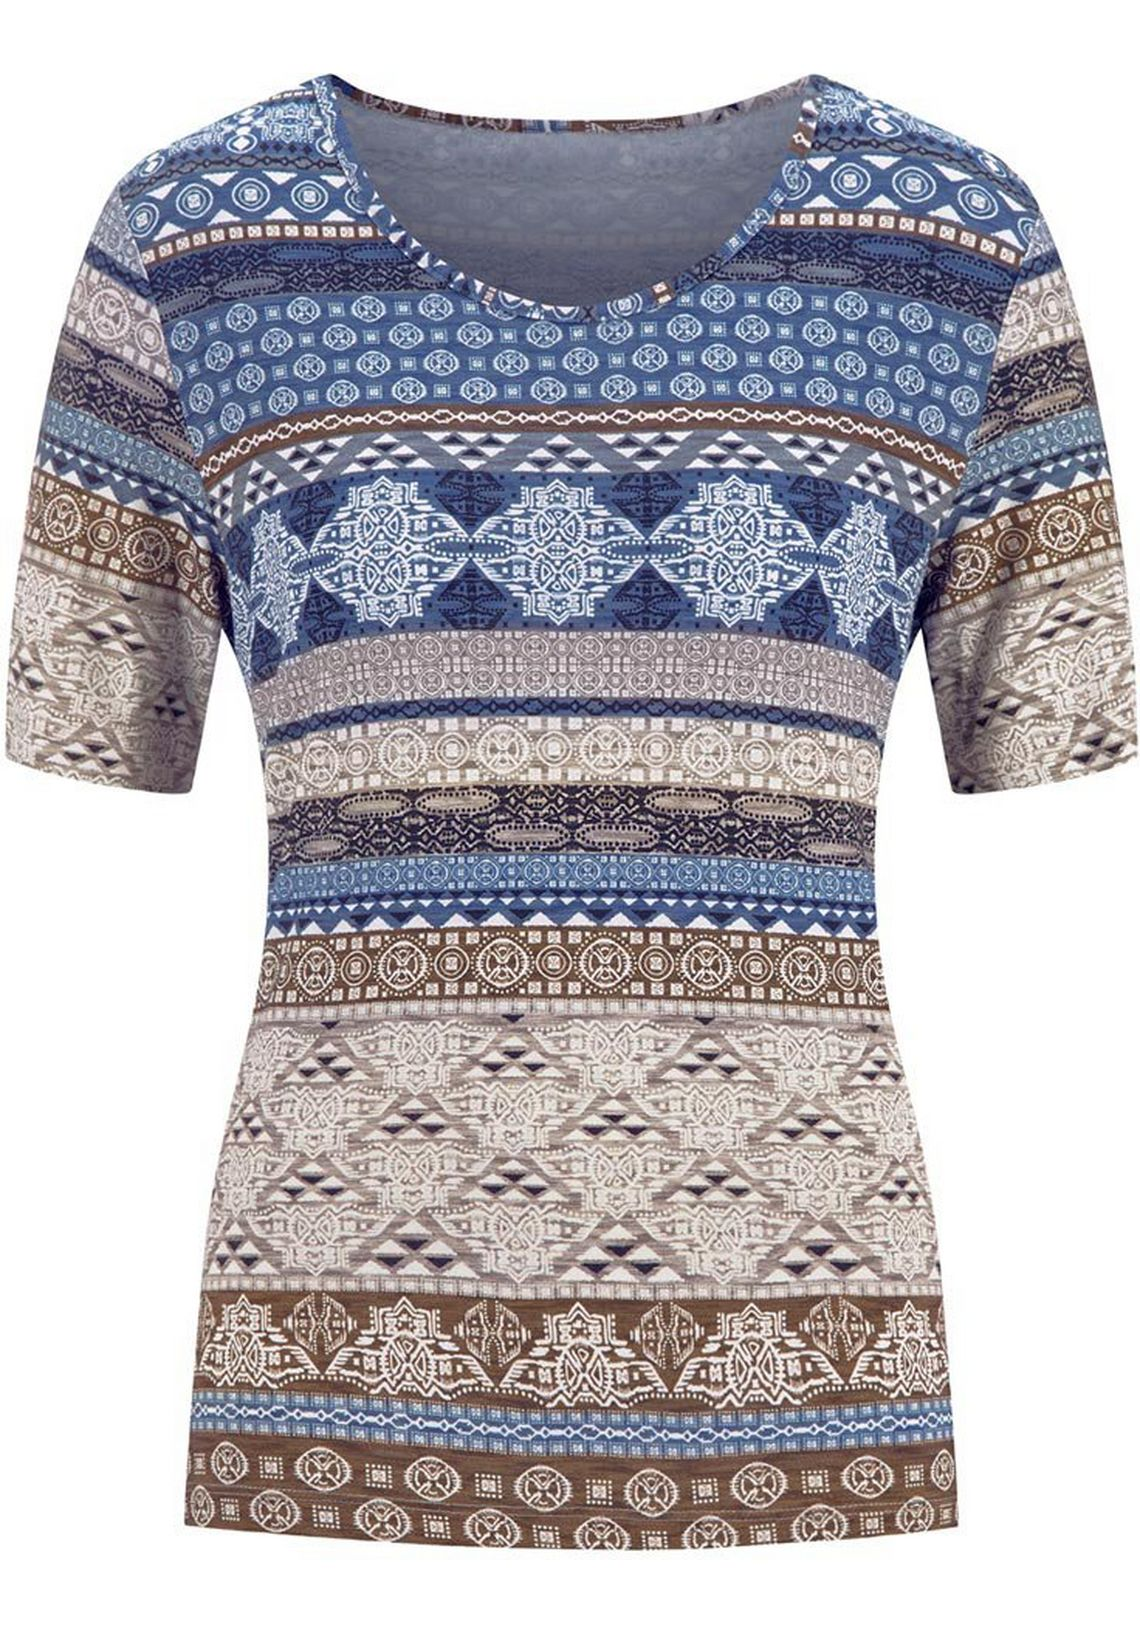 Casual Looks Shirt Met Vlotte Strepen Nu Online Kopen Marine Gedessineerd U4FnBqIi